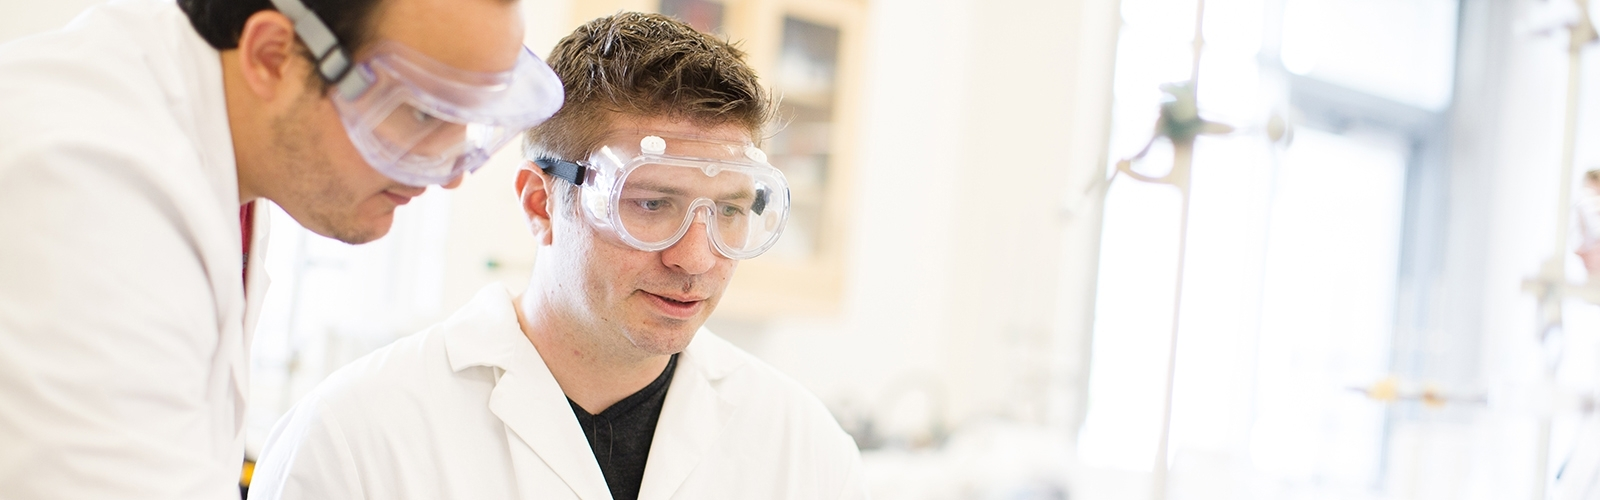 Hein Chemistry Lab